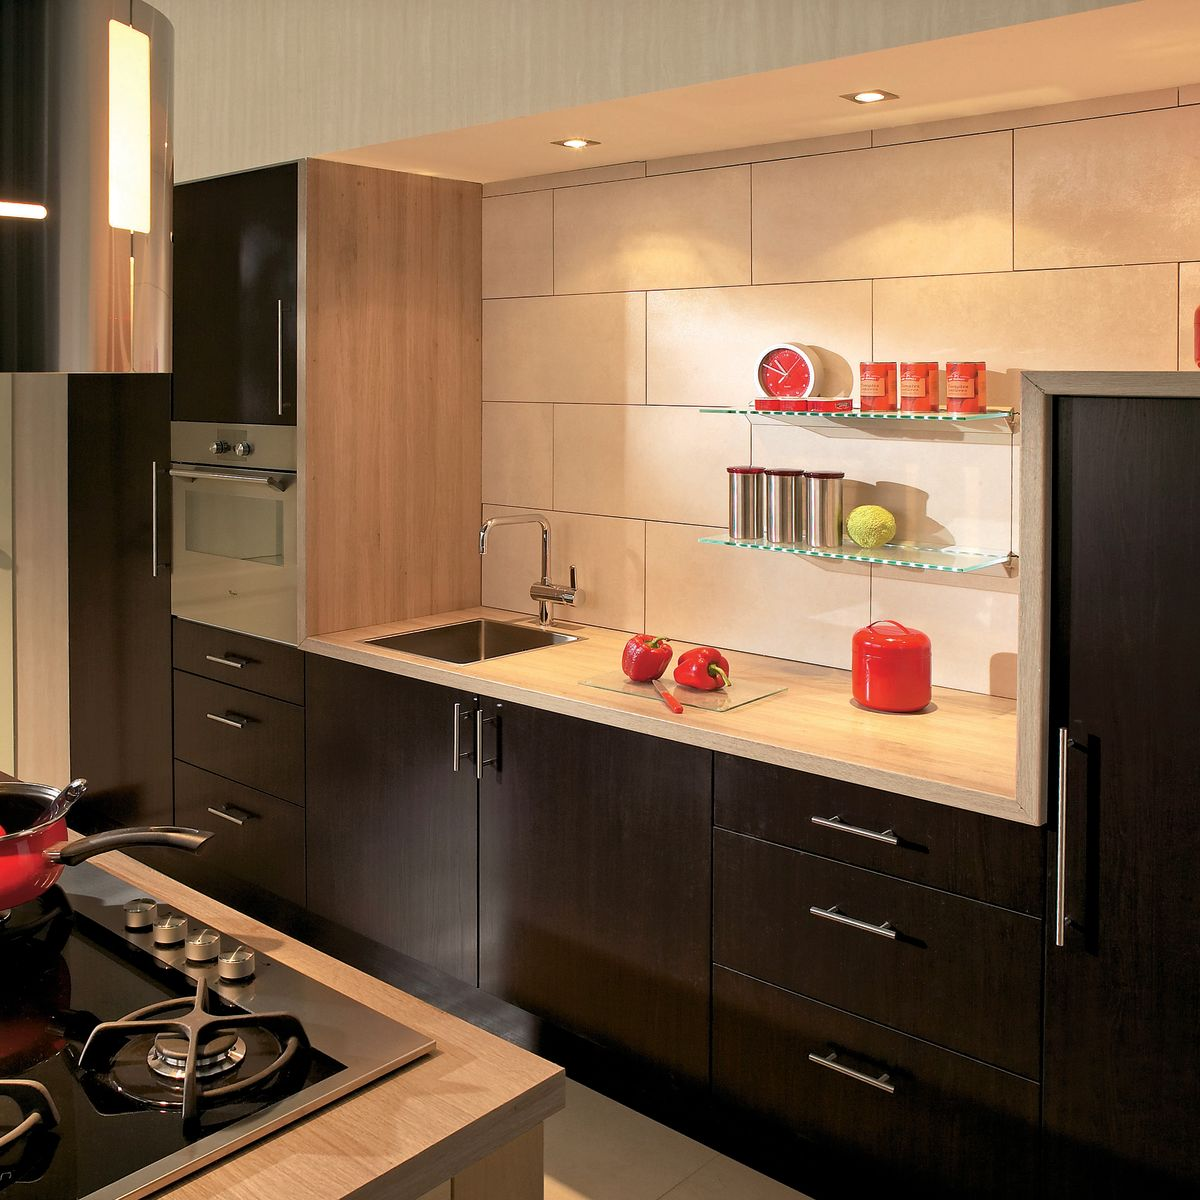 Favoloso Cucina Wenge Delinia: prezzi e offerte online   Leroy Merlin RQ67